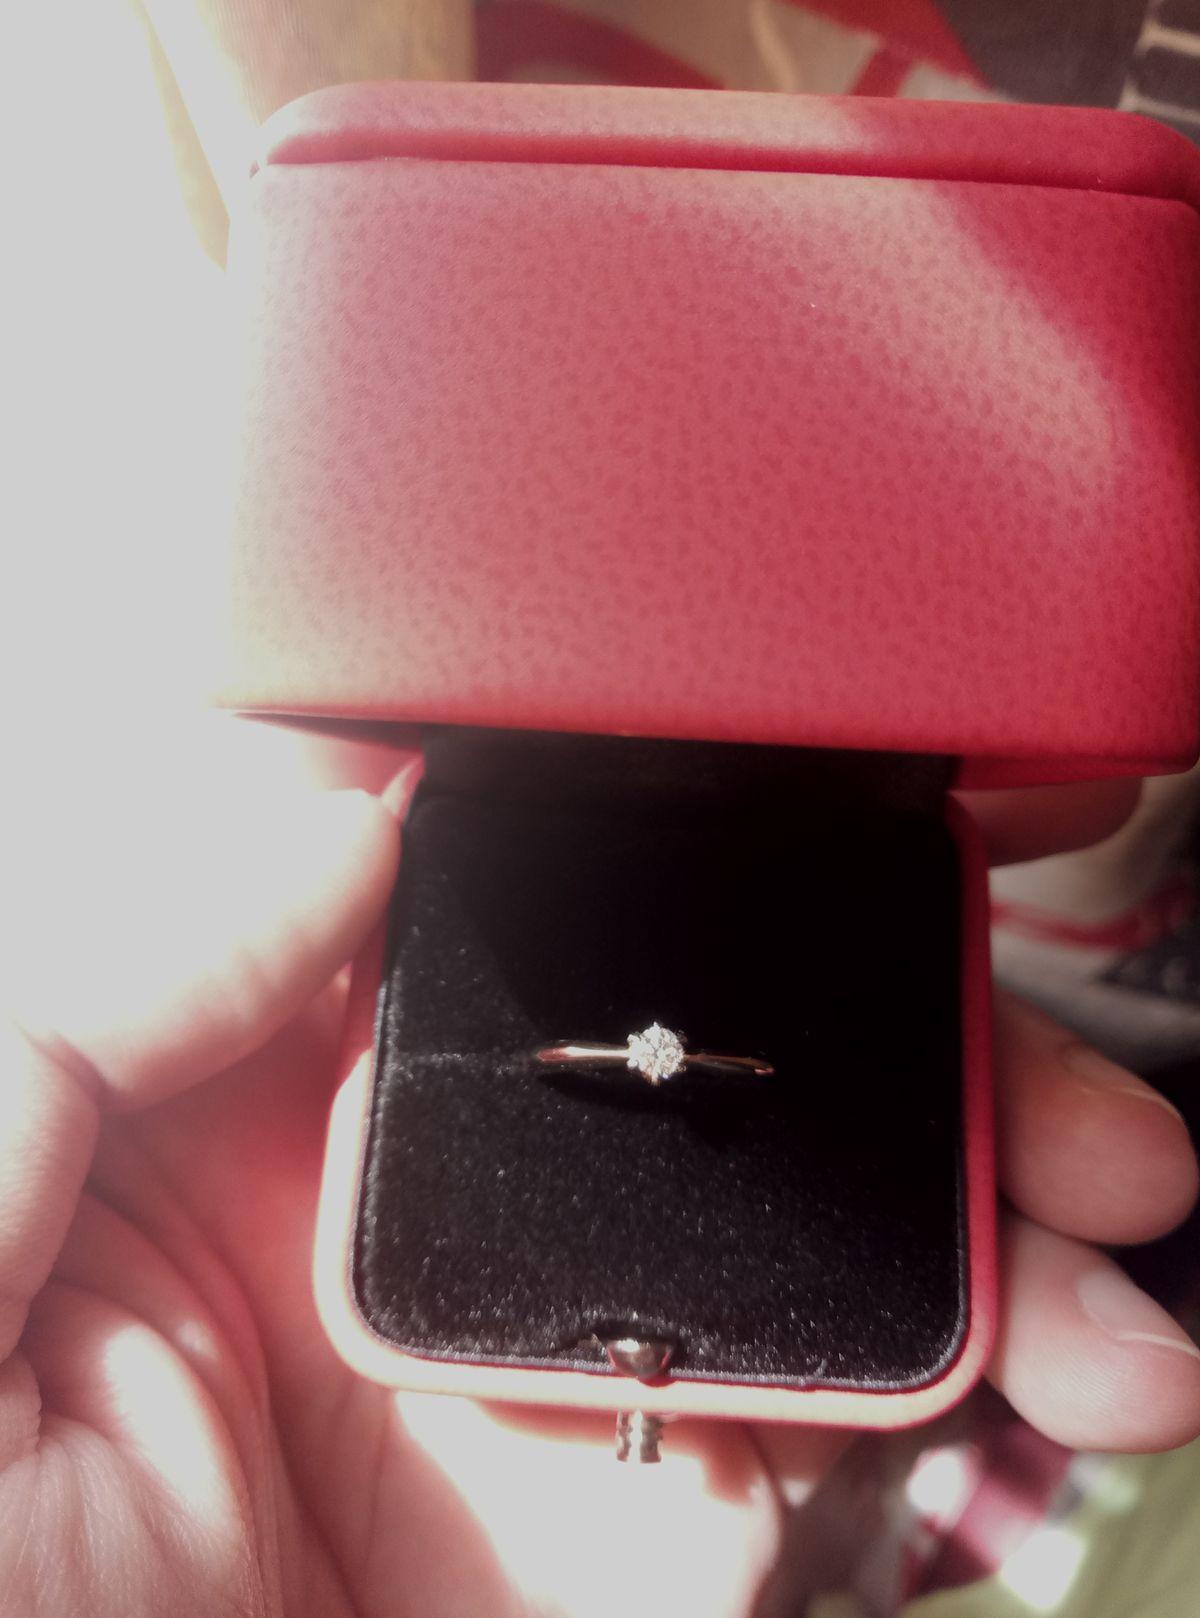 Кольцо с бриллиантом великолепно